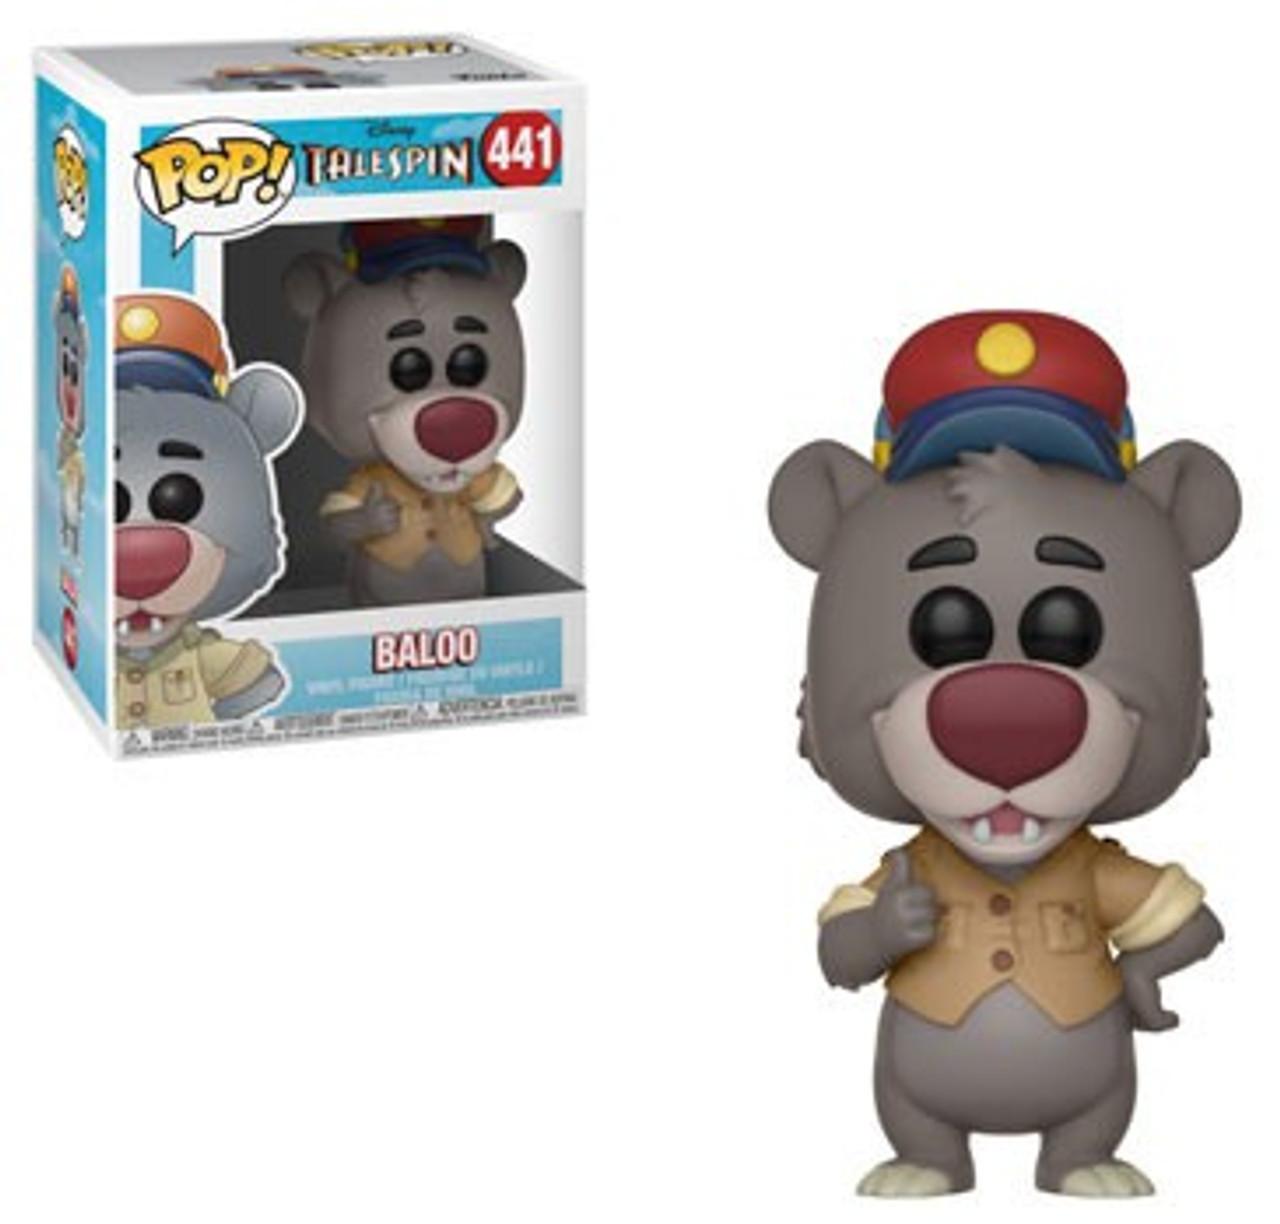 Baloo Disney Afternoons Funko Mystery Mini Vinyl Figure 1//36 Tailspin